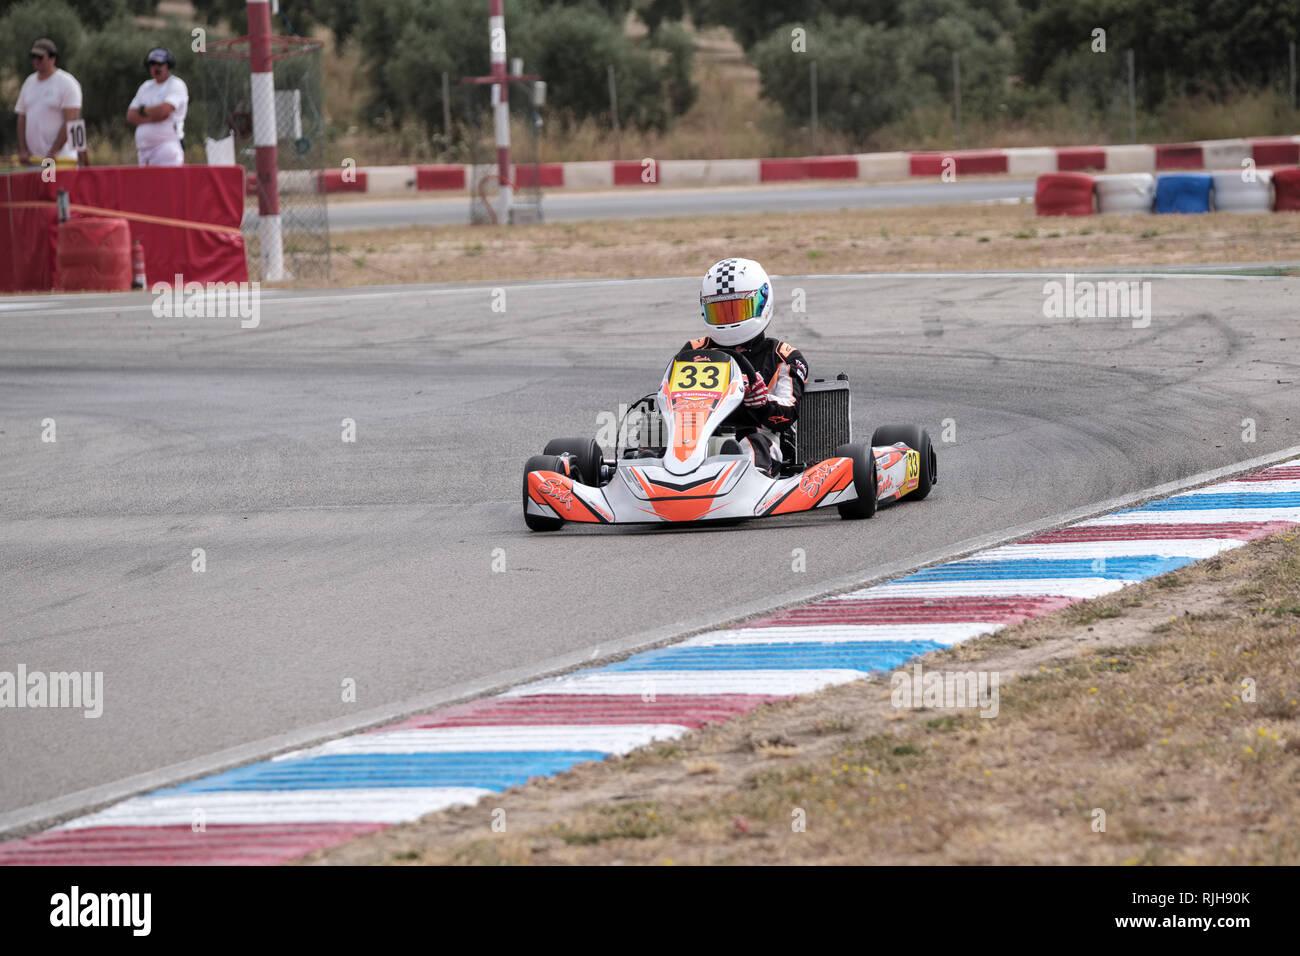 Go Kart Racing auf der Strecke in Campillos, Malaga, Spanien Stockbild